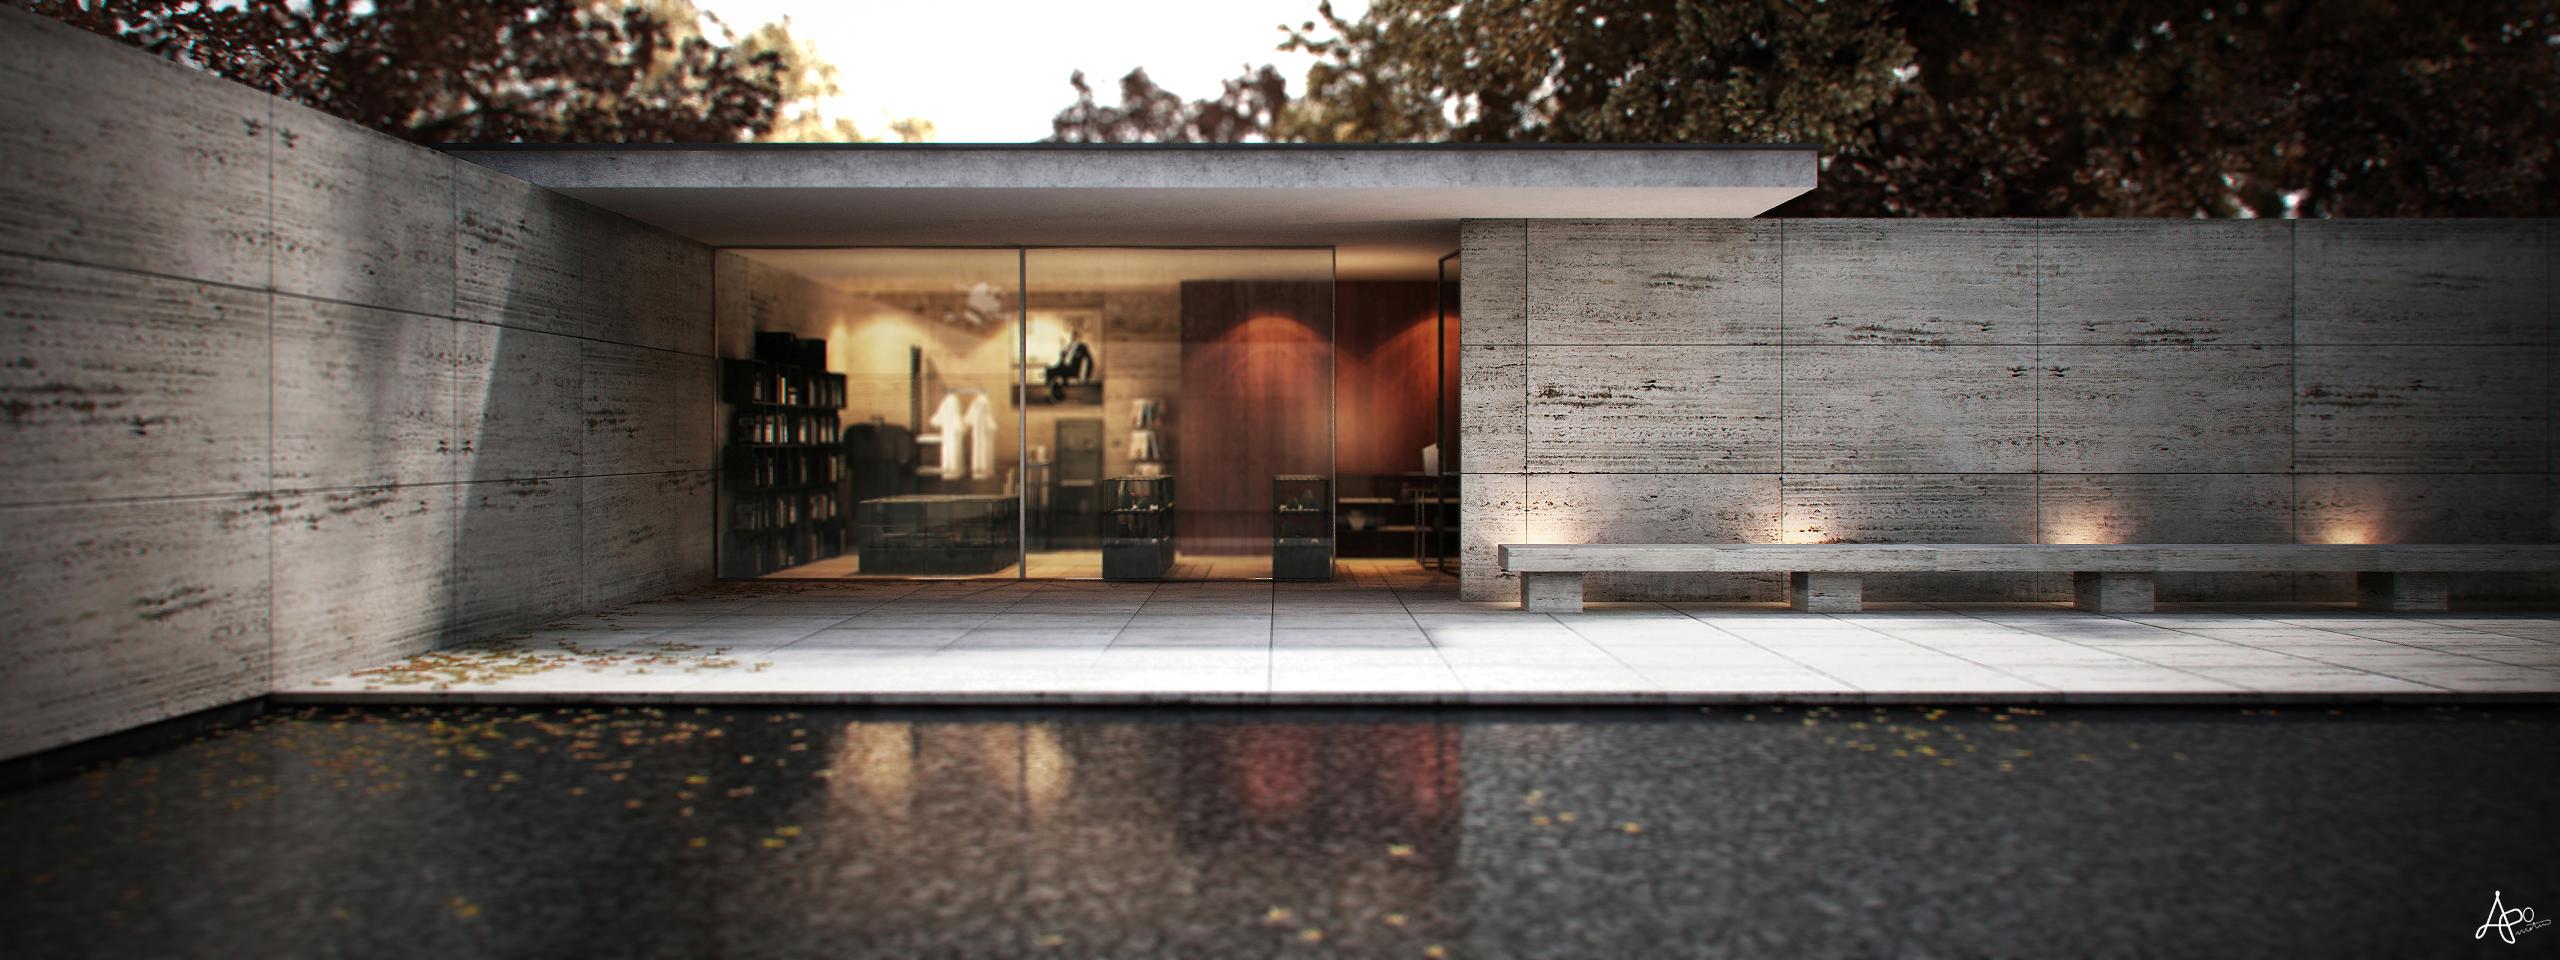 architect mies van der rohe i by apometru on deviantart. Black Bedroom Furniture Sets. Home Design Ideas